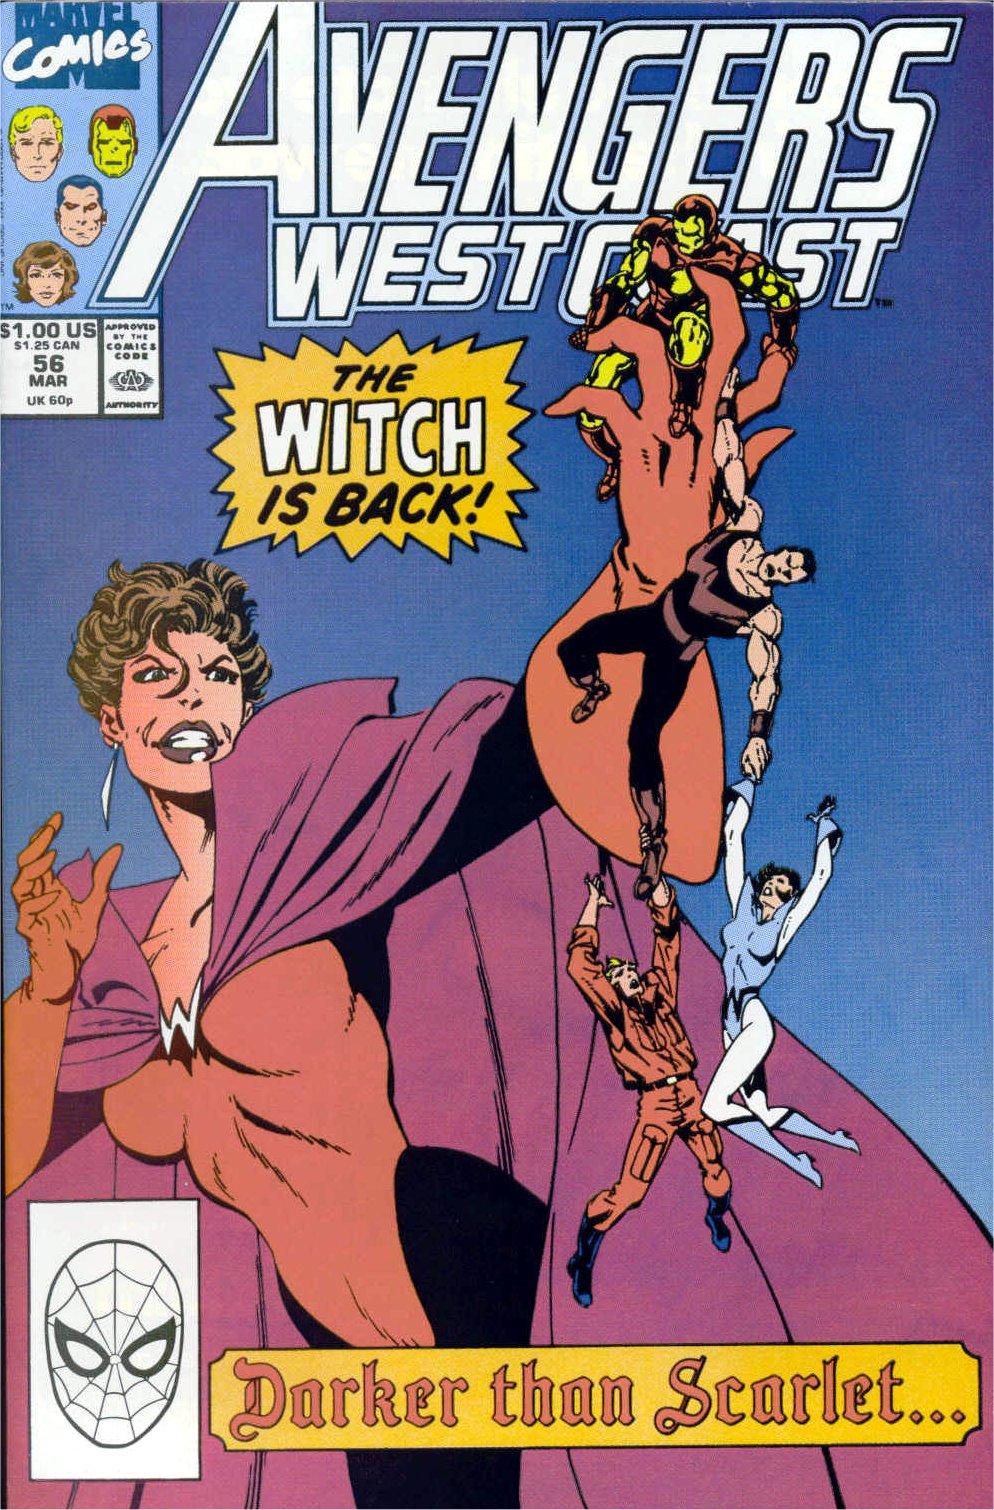 Avengers West Coast (1989) 56 Page 1